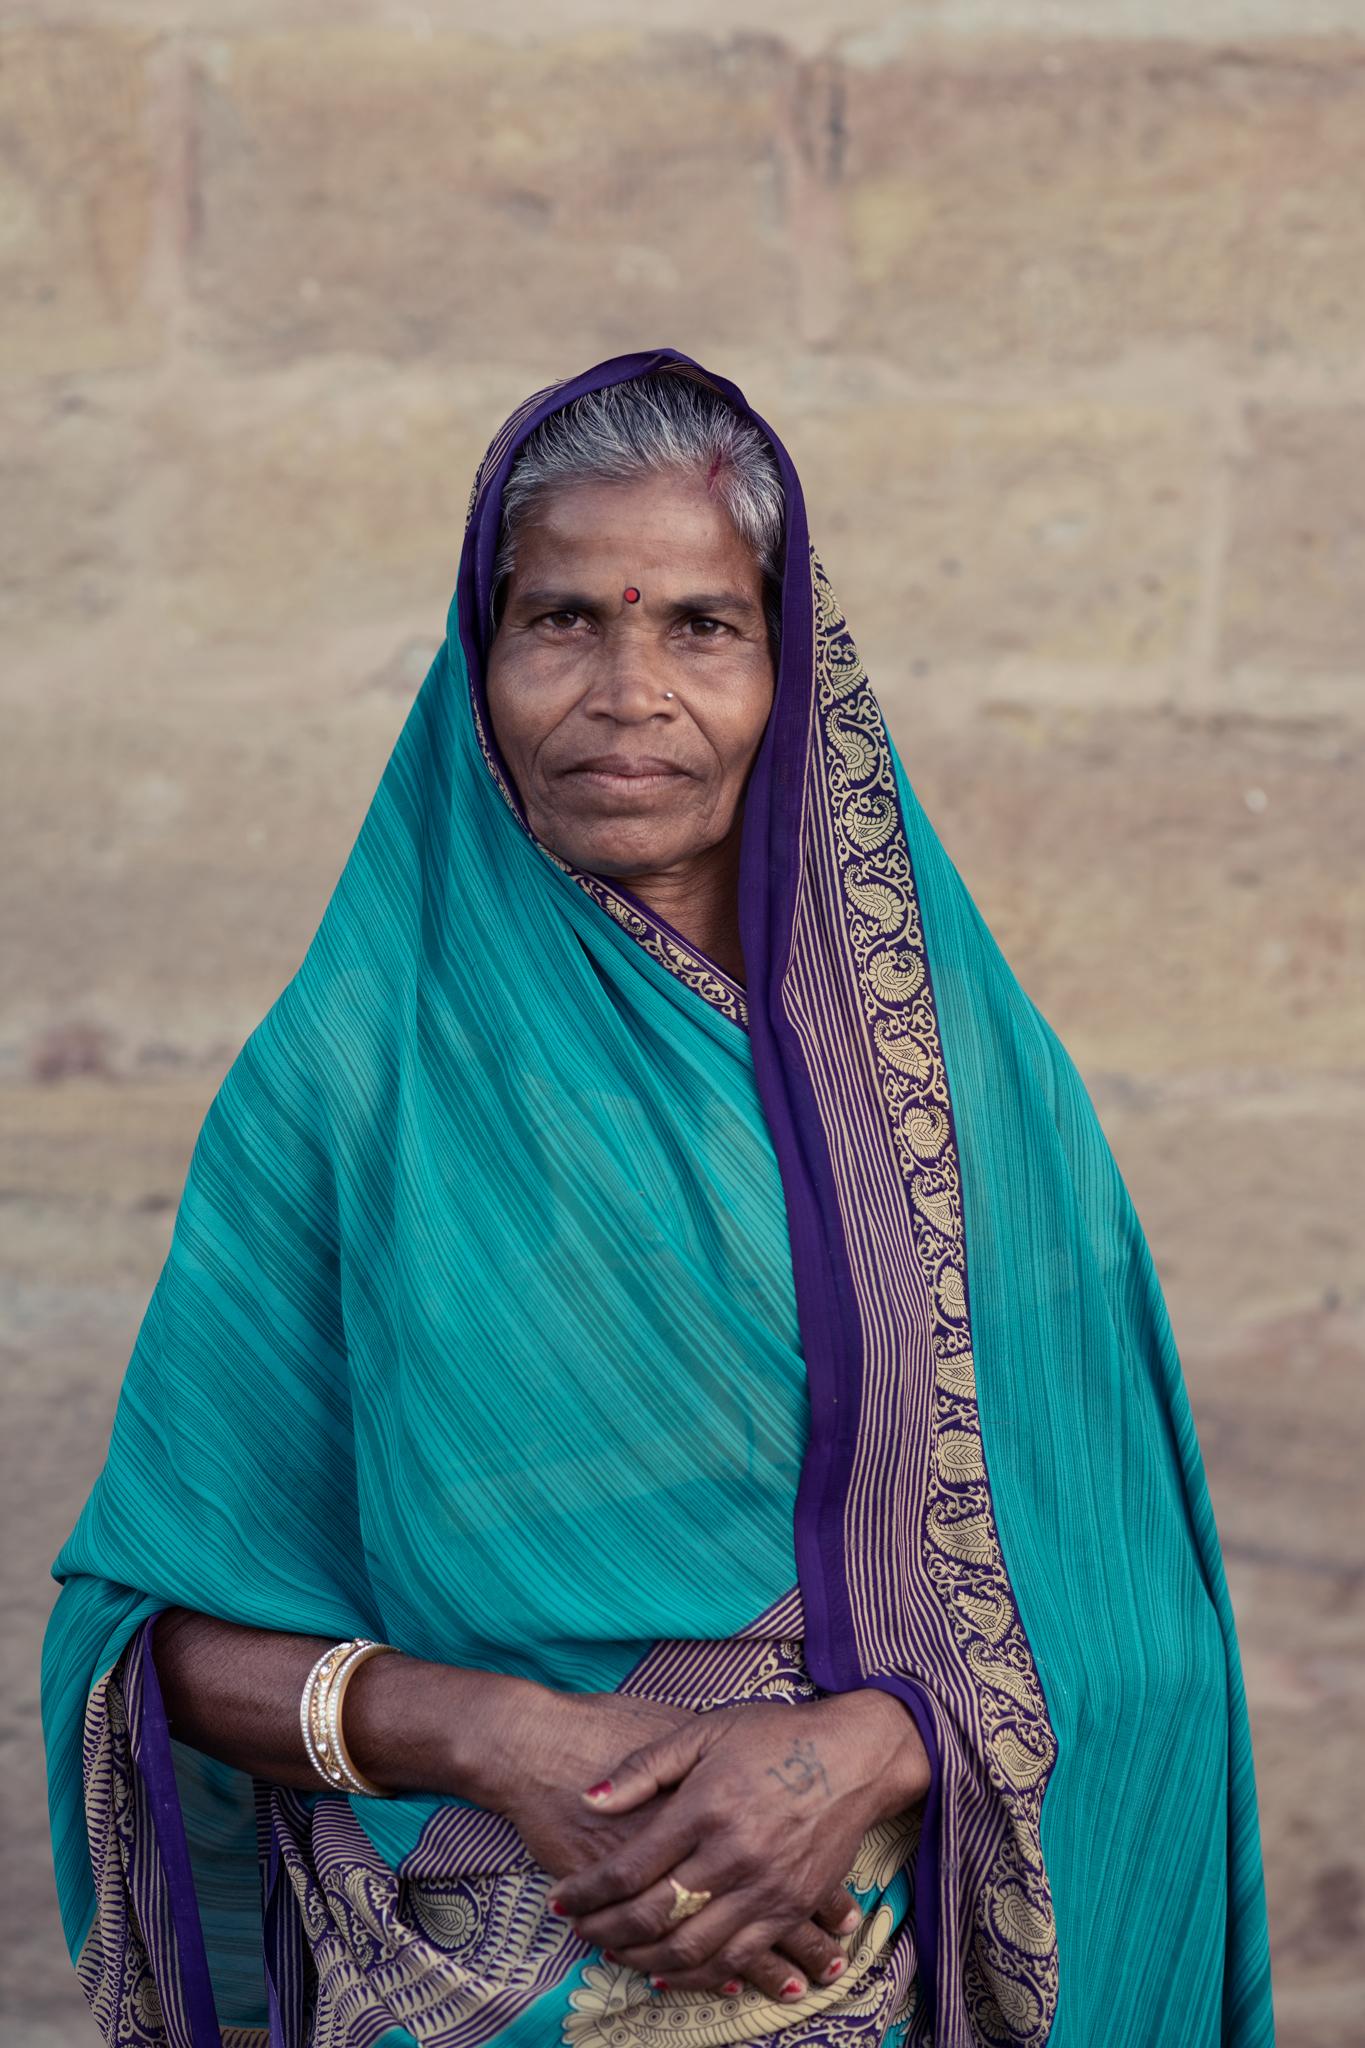 Varanasi_portrait_travel_photography_Manchester_Adventure_Photographer_Jan_Bella1.jpg